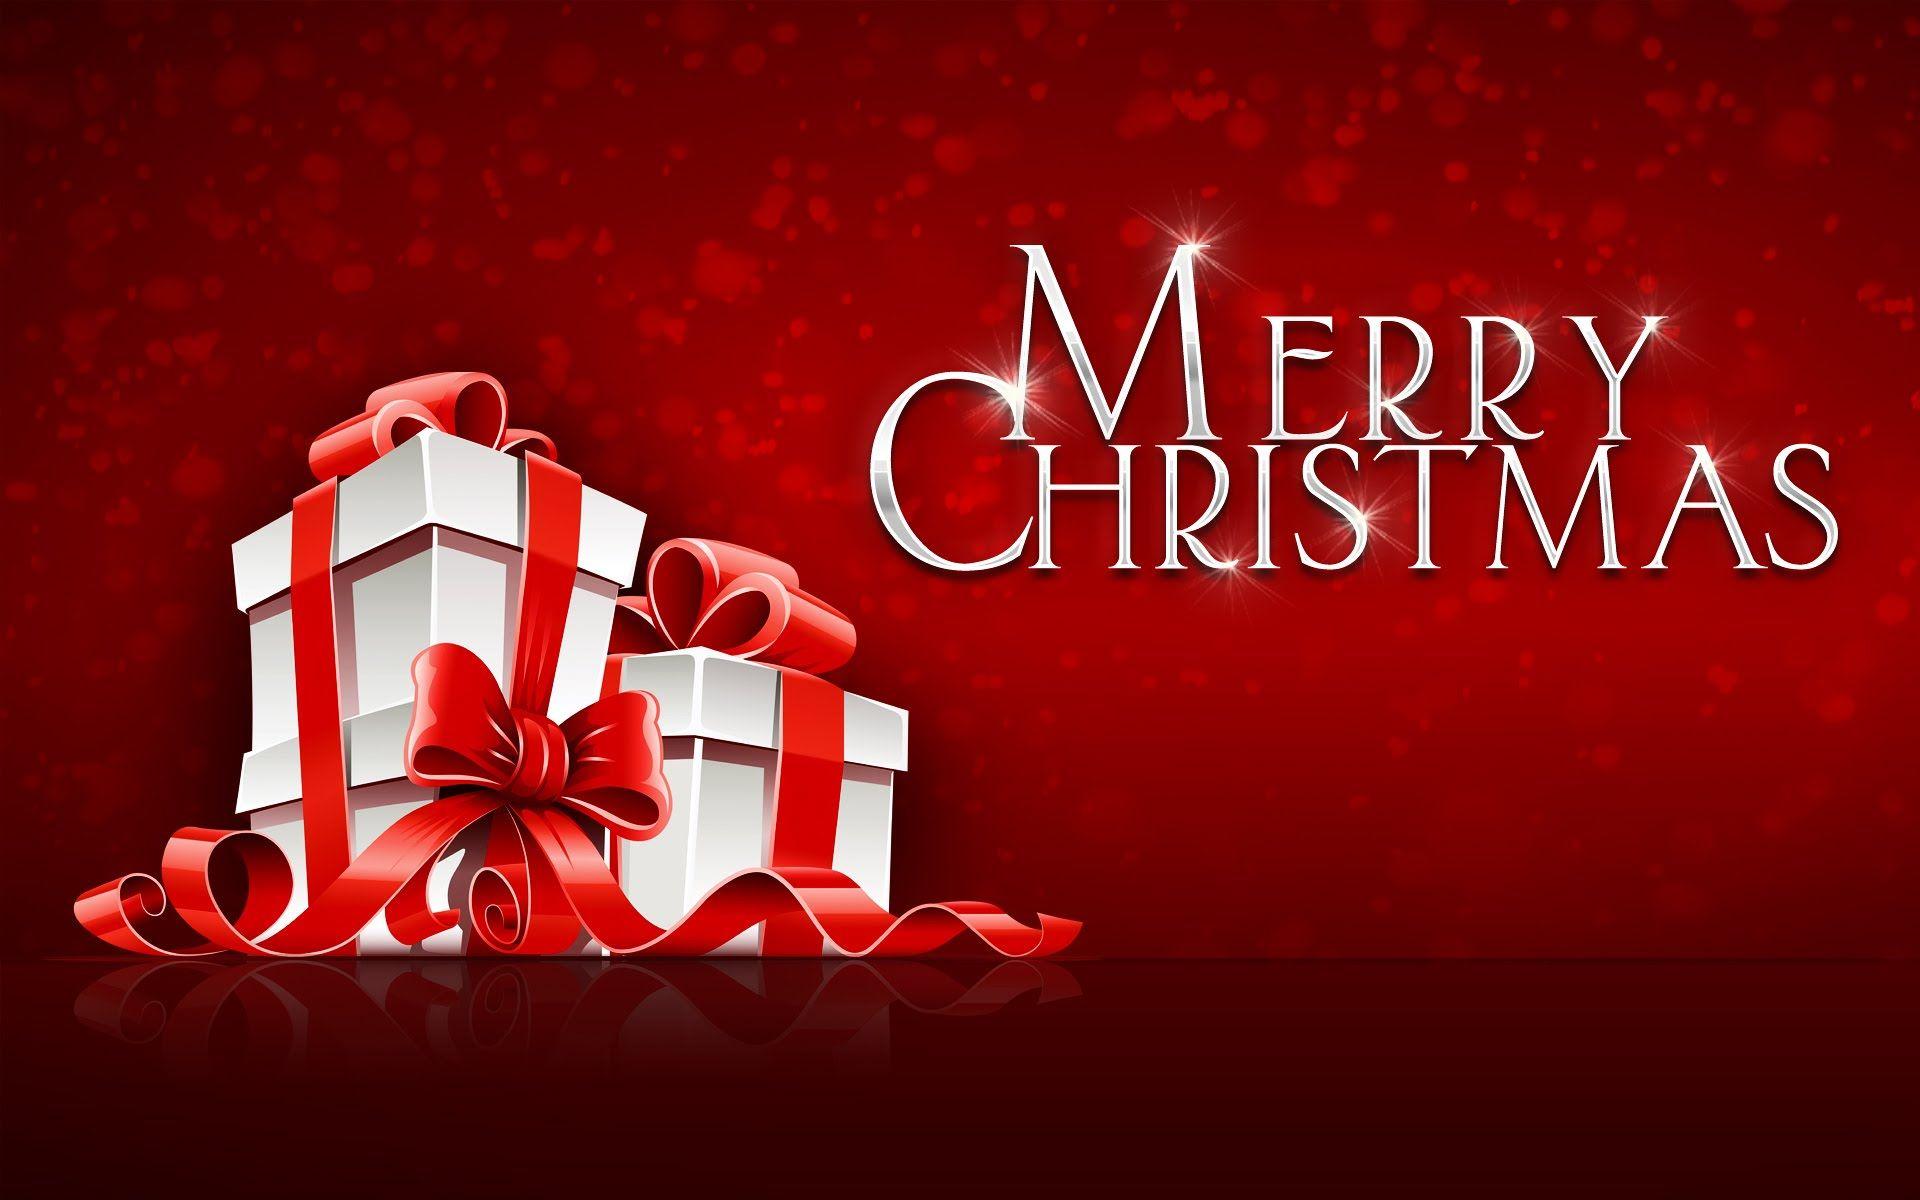 Beautiful Wallpaper Love Merry Christmas - b2de89873ededf216f645889b3eda9b3  Gallery_732111.jpg